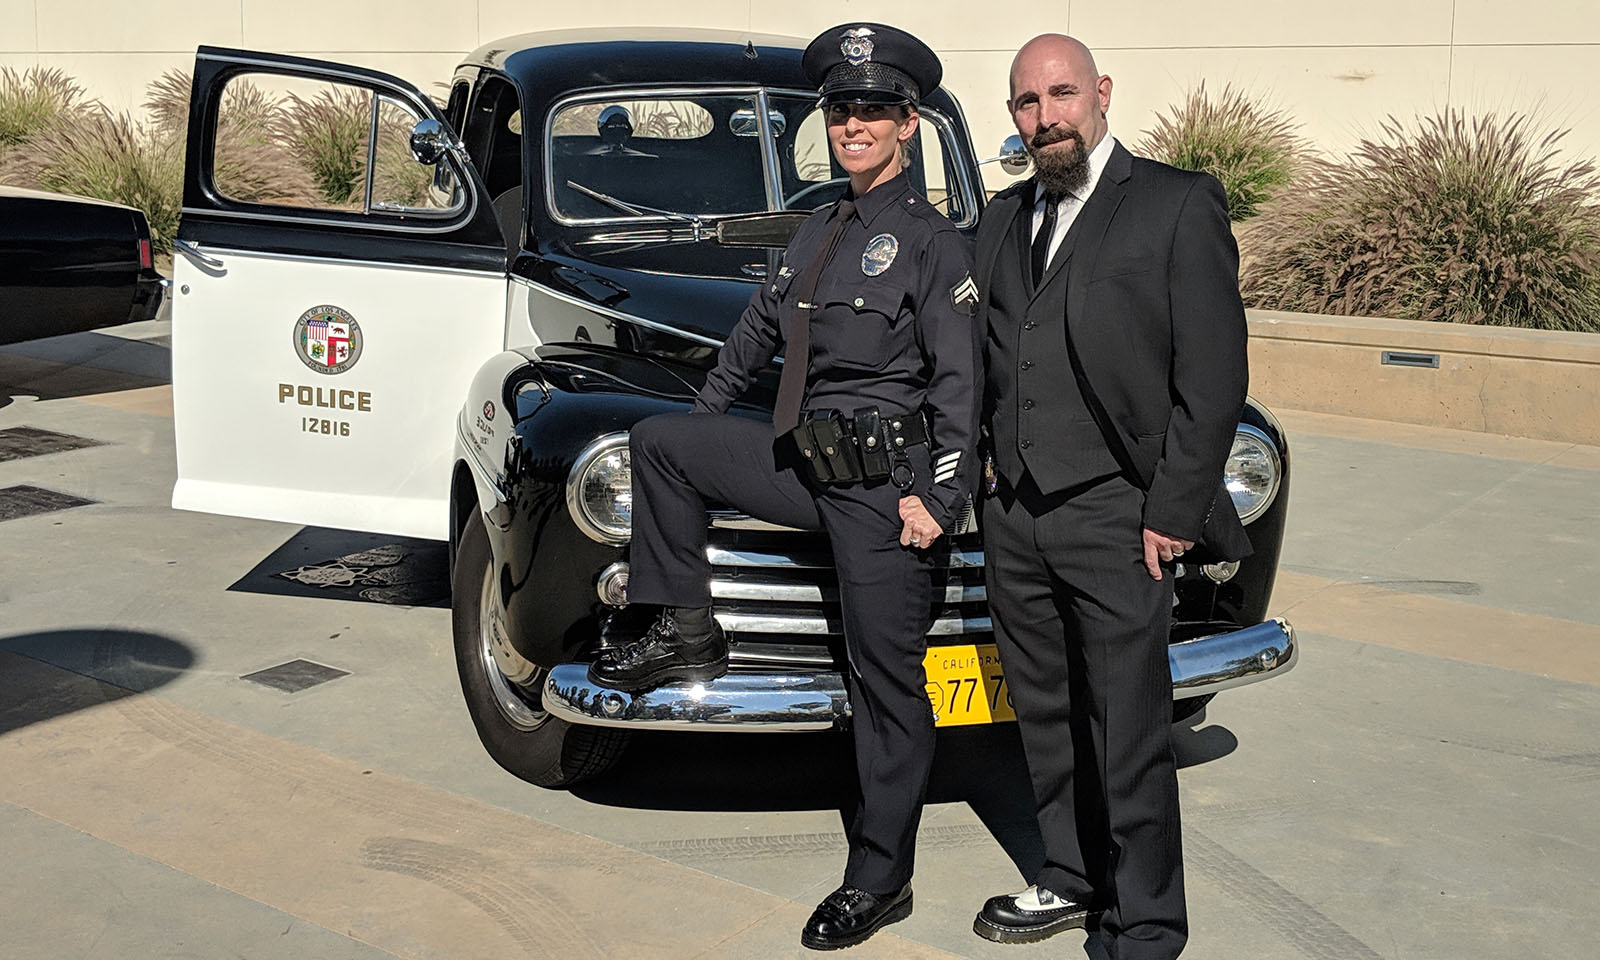 Police Officer, Weapons Instructor, Jiu-Jitsu Competitor